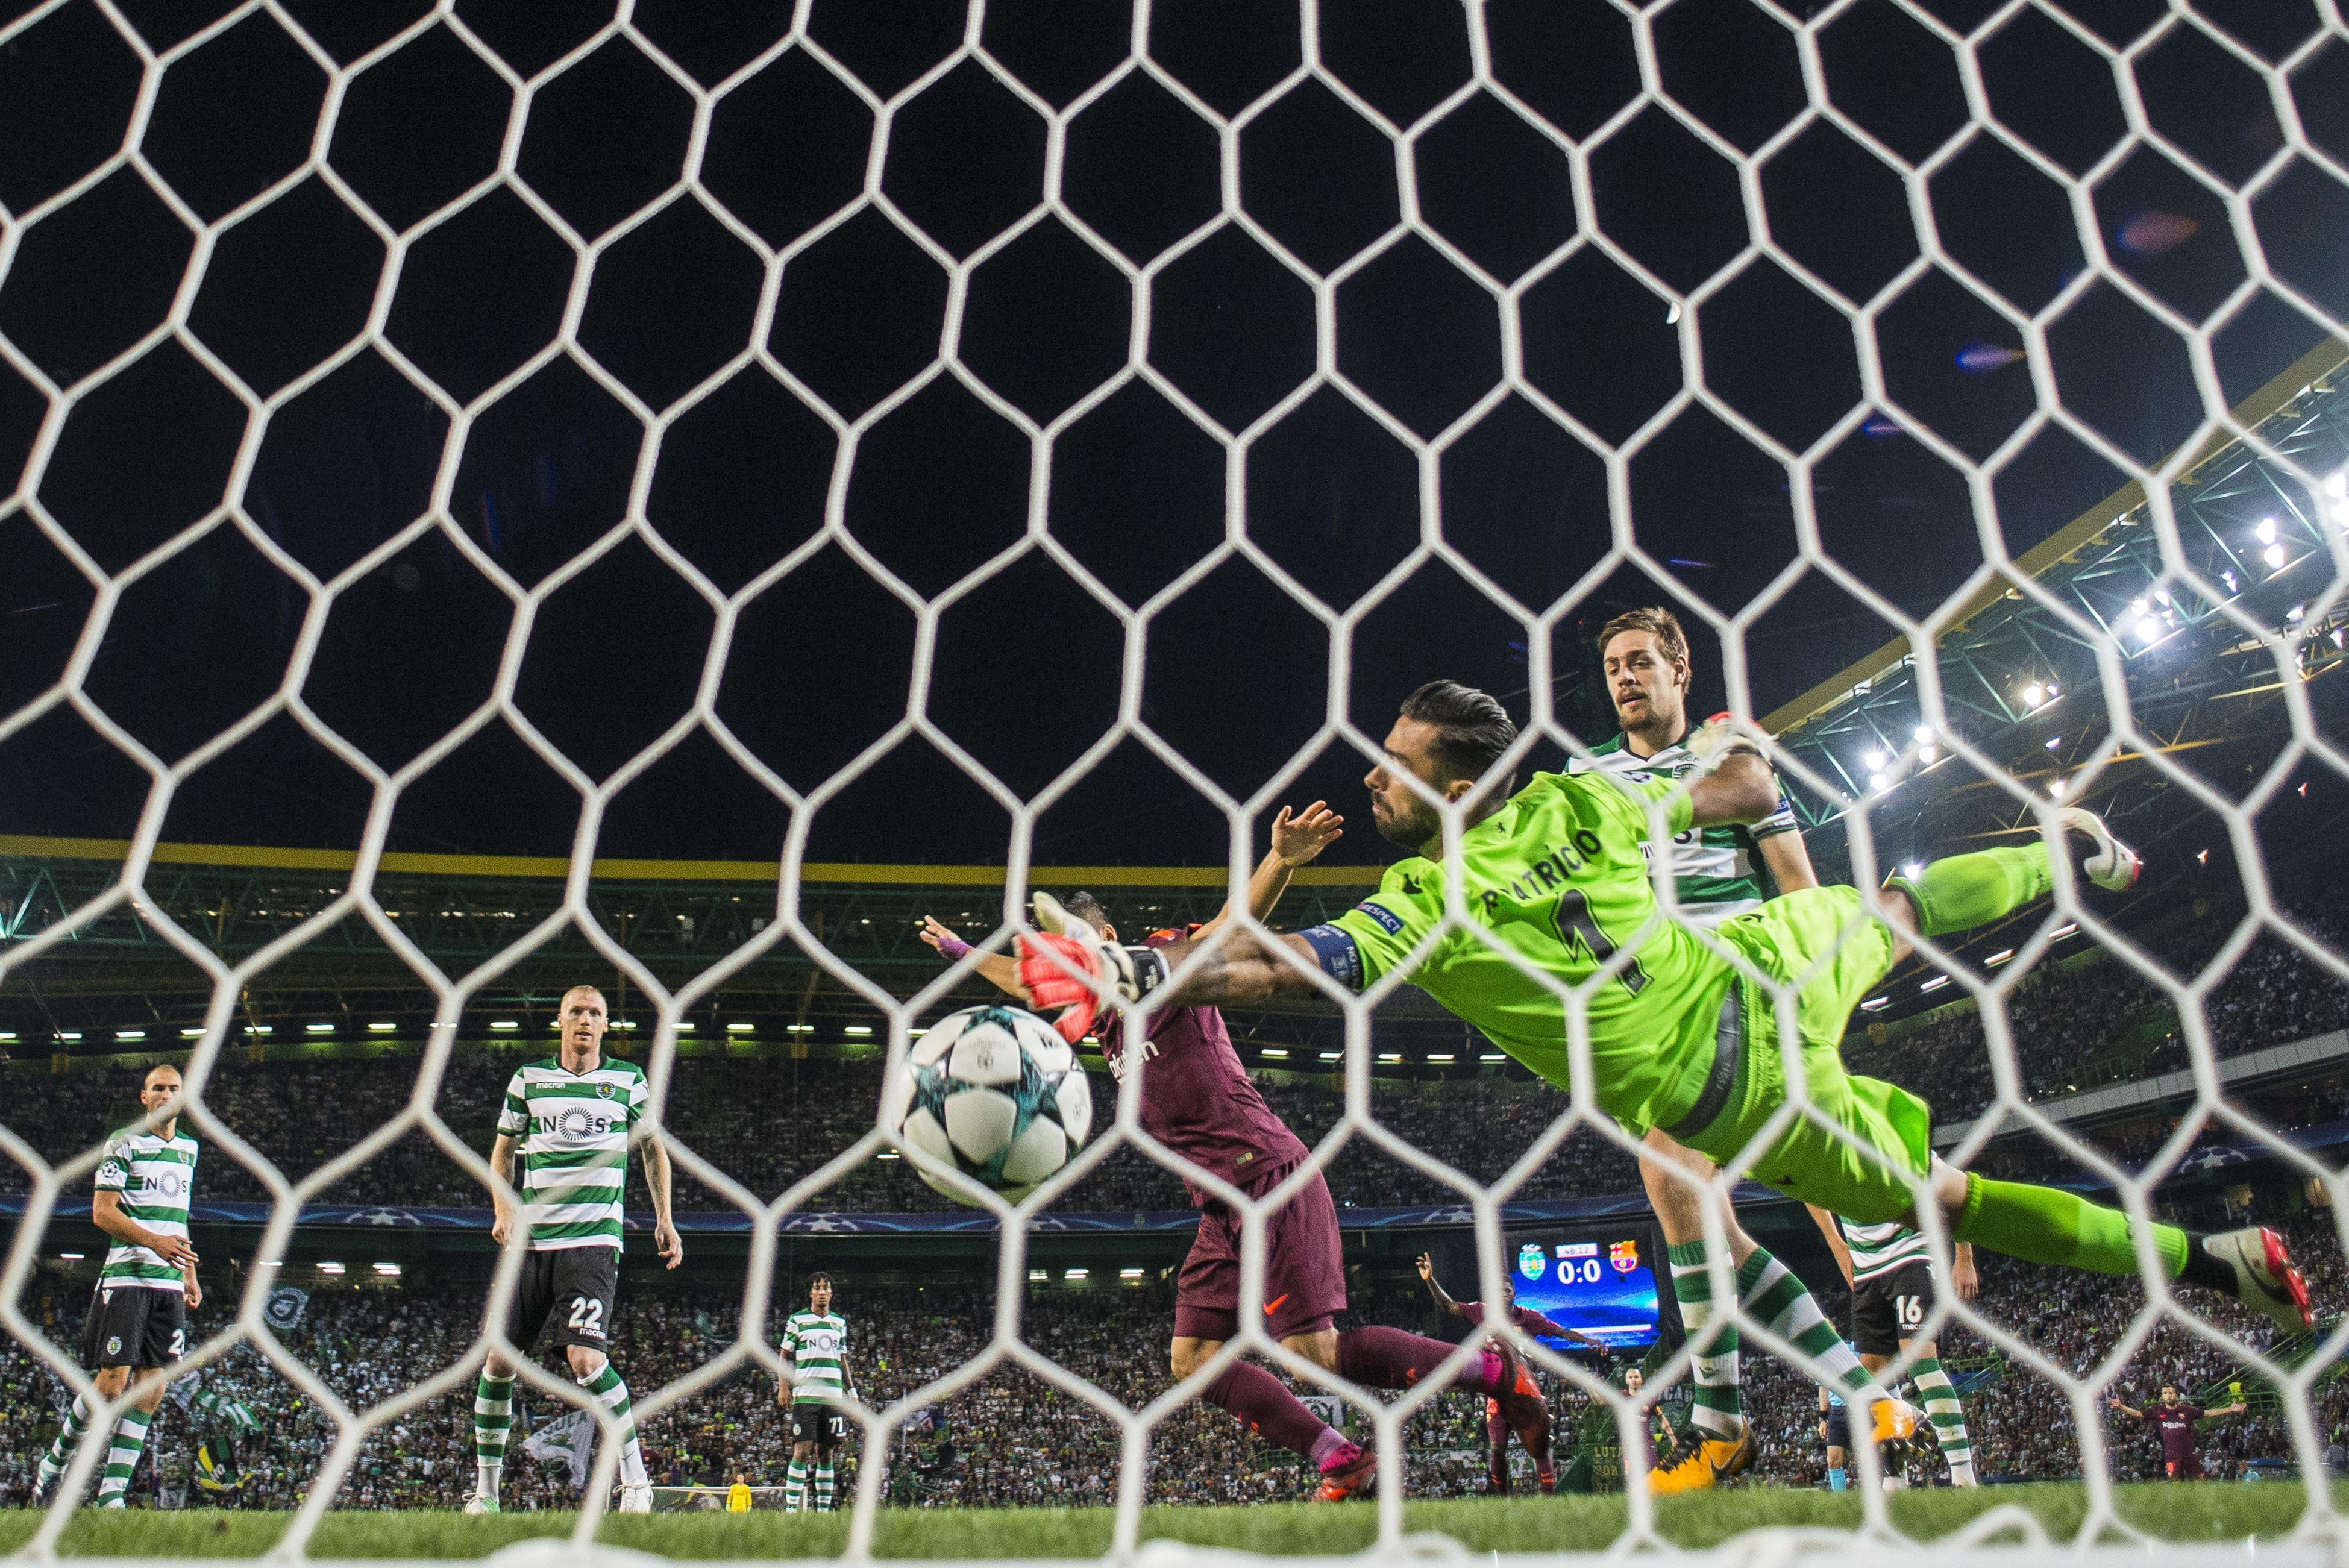 Sporting Lisbon 0-1 Barcelona, 2017 Champions League: Match Review